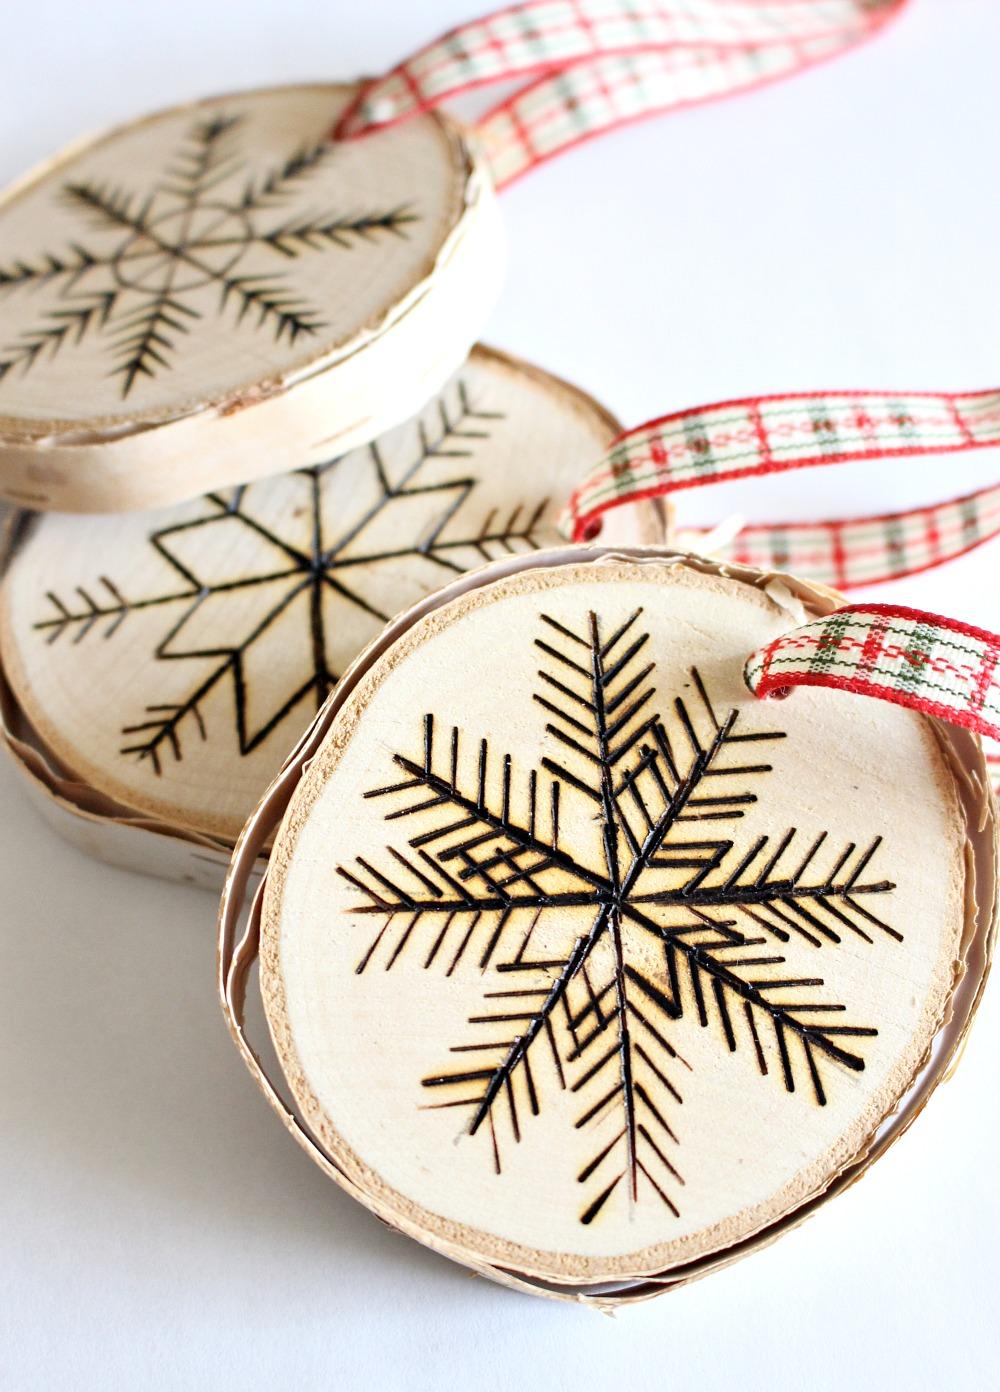 DIY Wood Burned Birch Slice Ornament